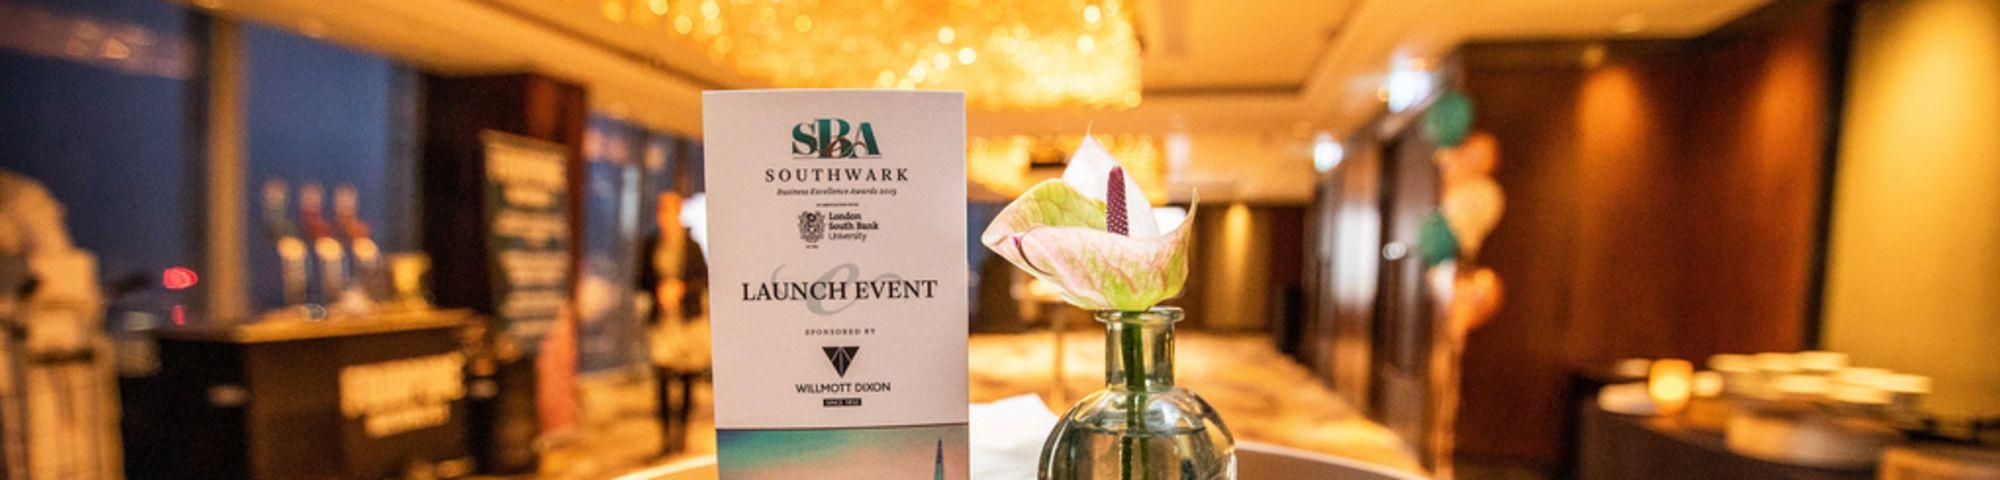 Southwark Business Awards 6